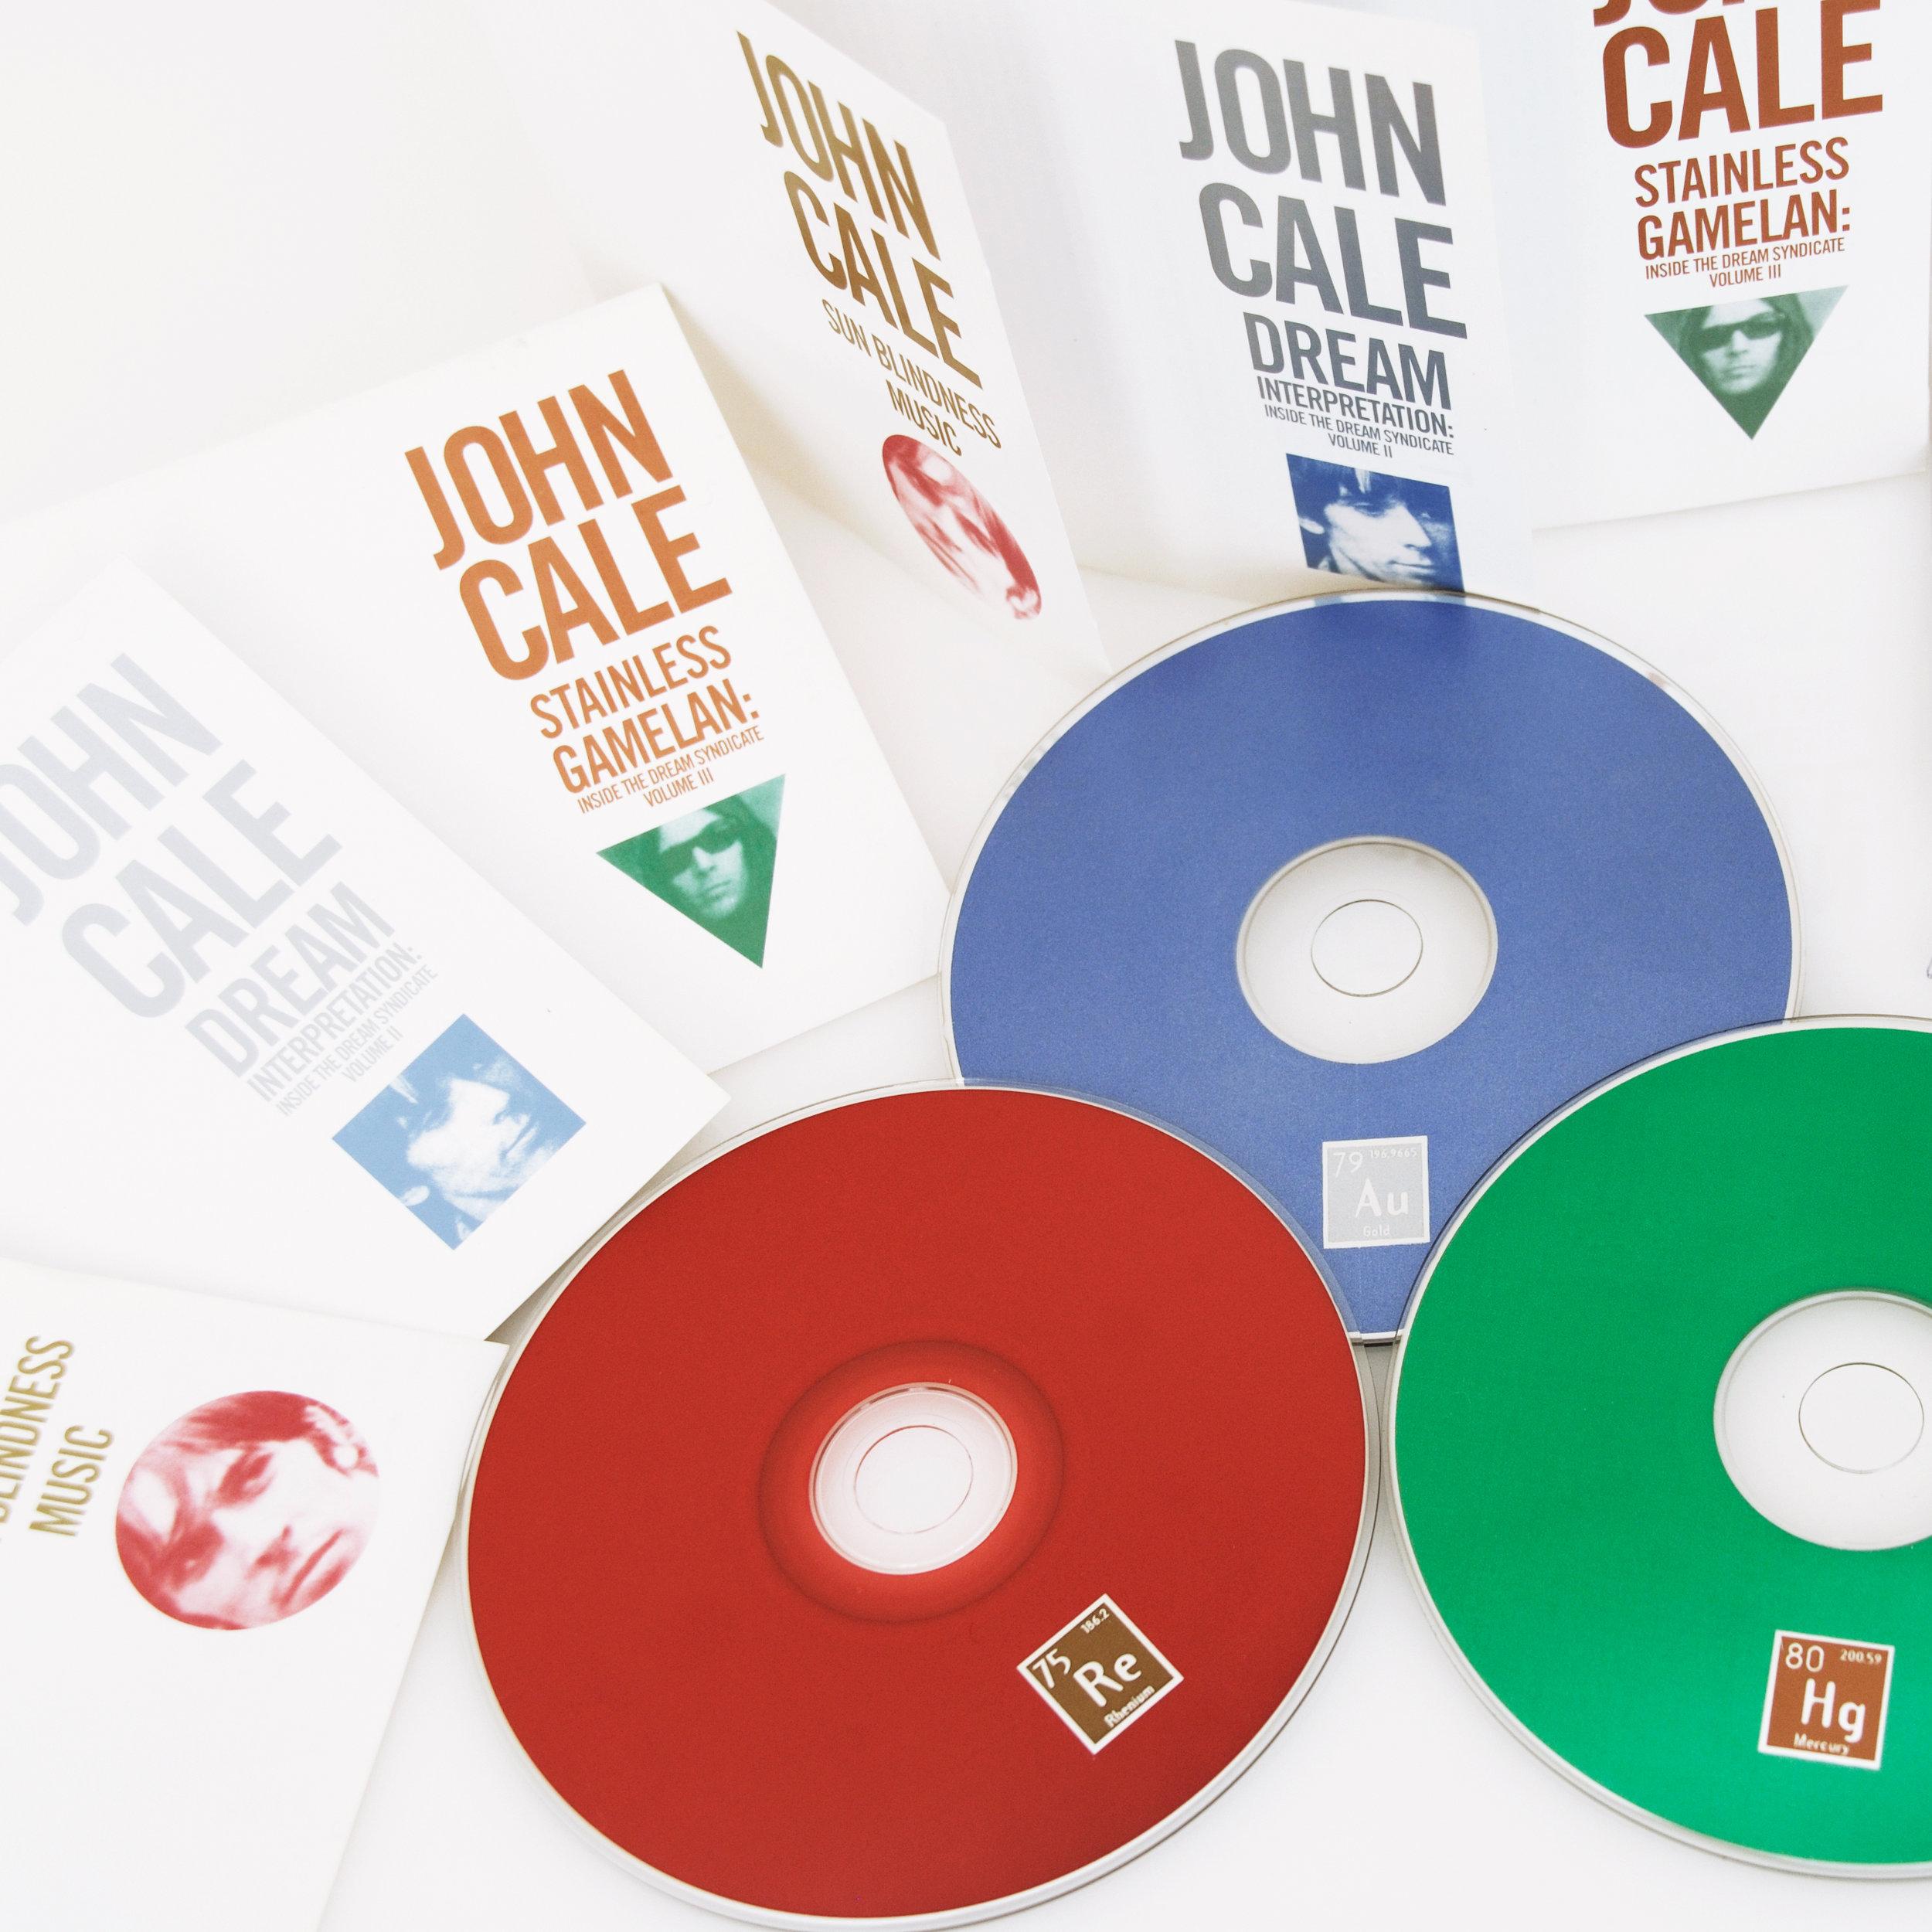 TOE-CD-CALEX3_036_1.jpg